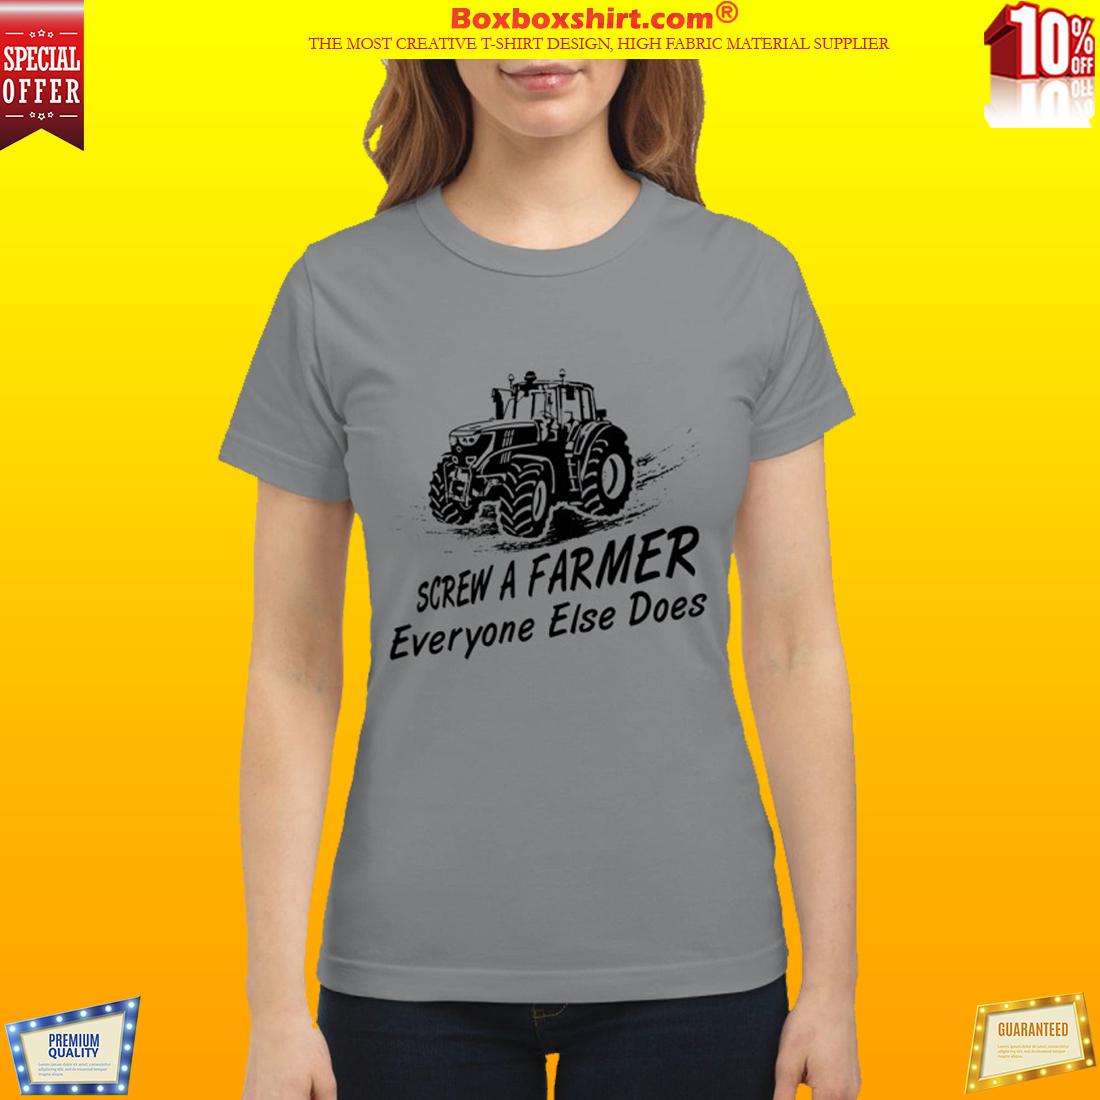 Screw a farmer everyone else does classic shirt